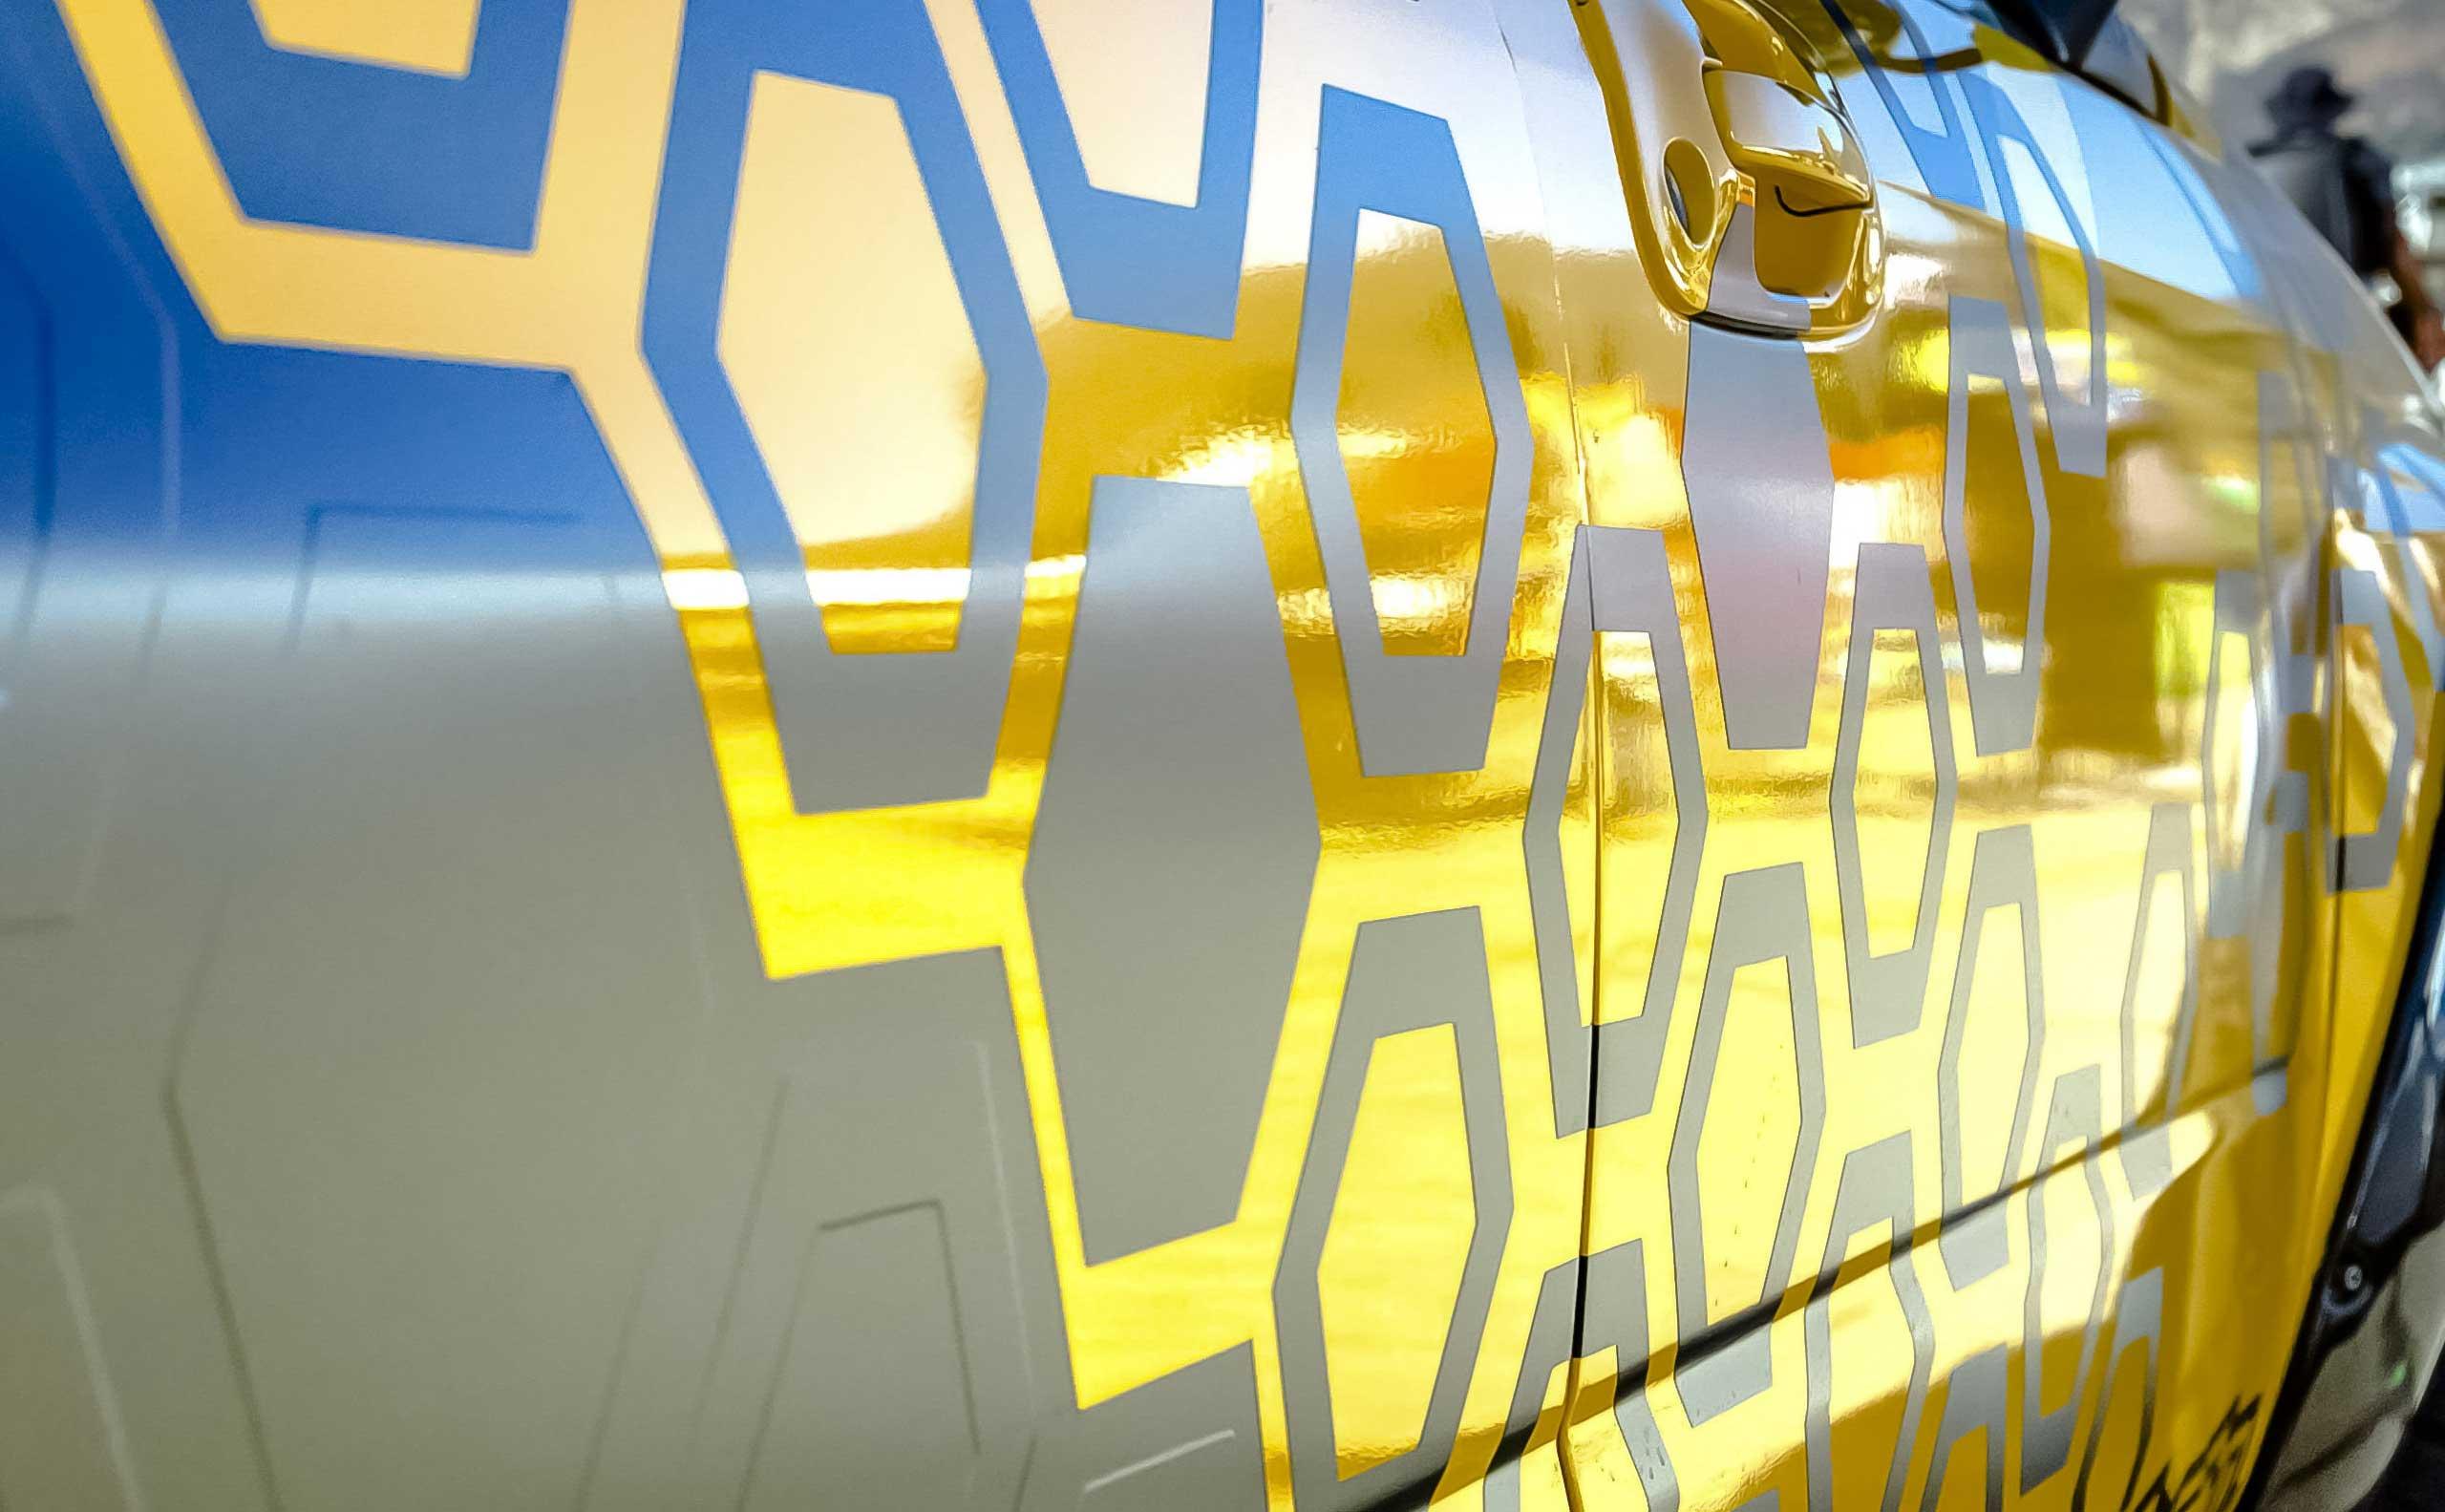 Vehicle graphics that looks like honeycomb